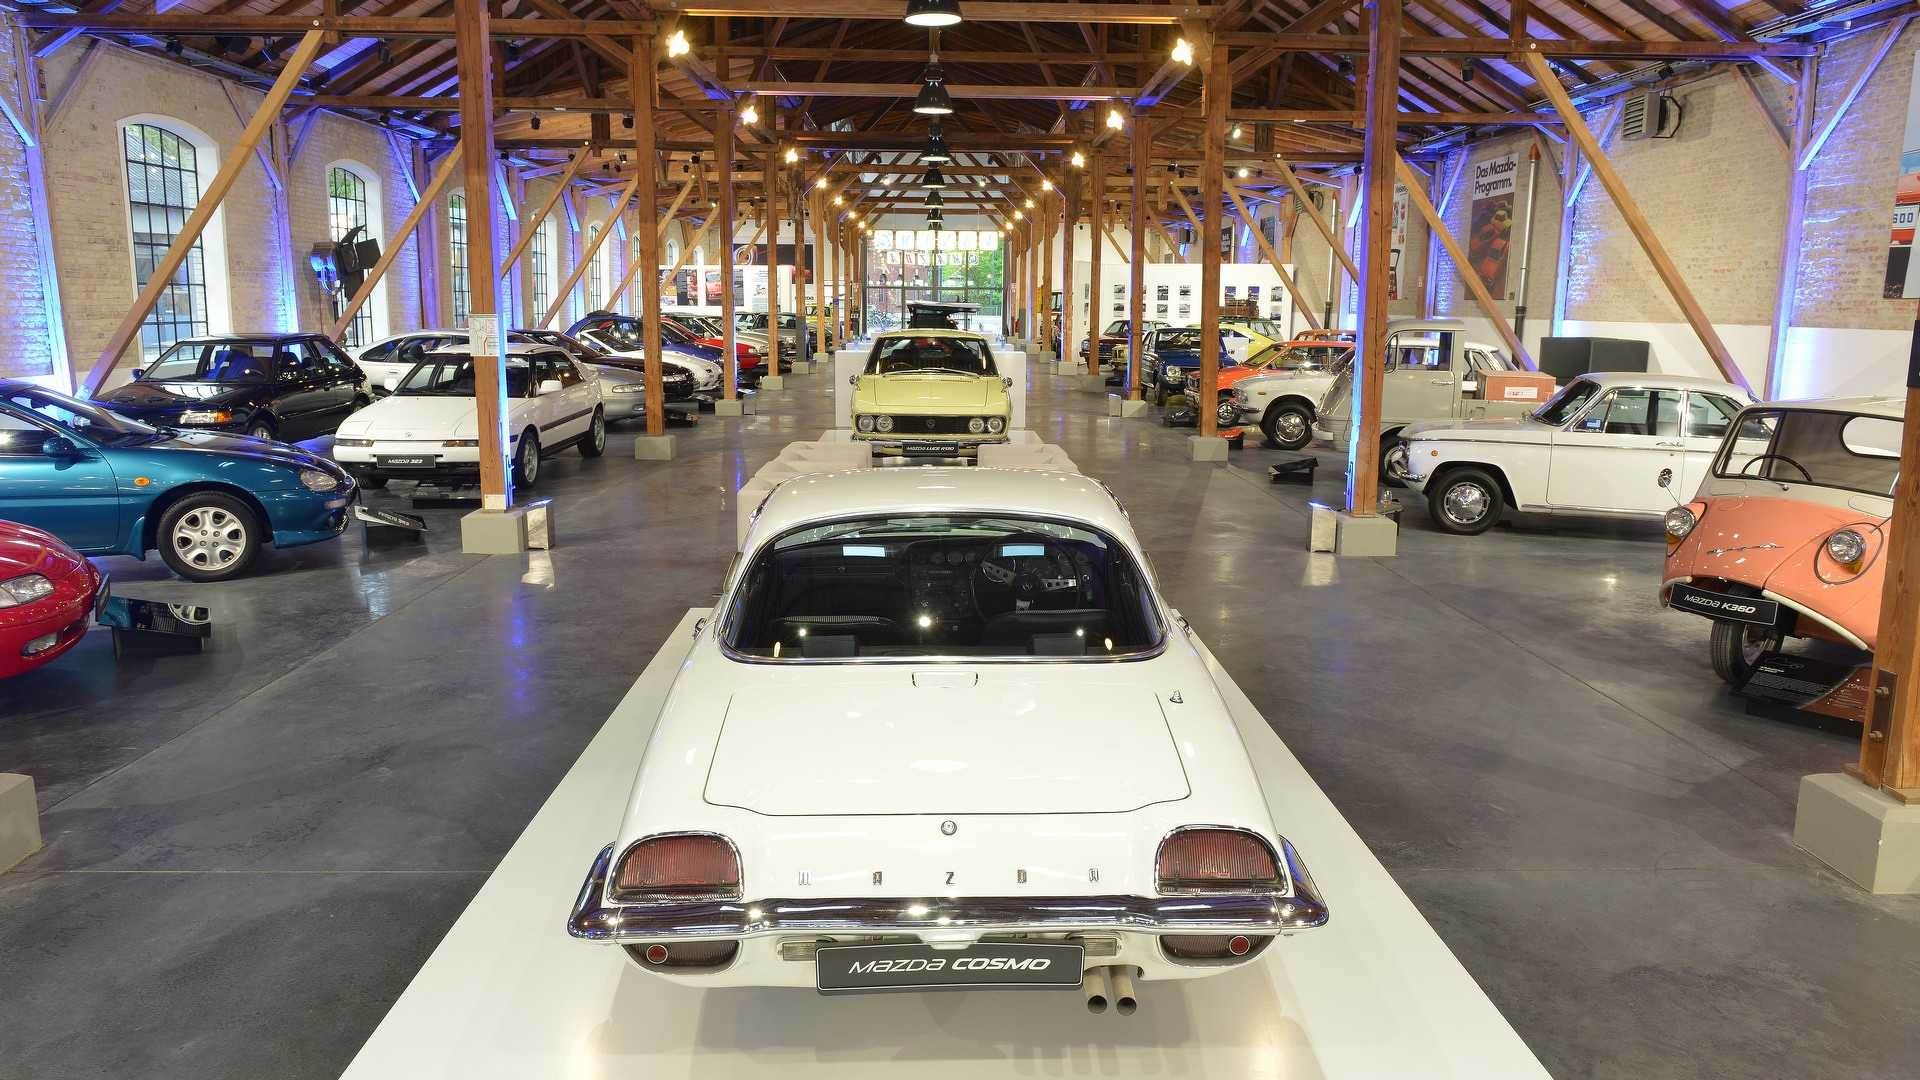 Mazda Opens Classic Car Museum In Germany Autoevolution - Classic car museum